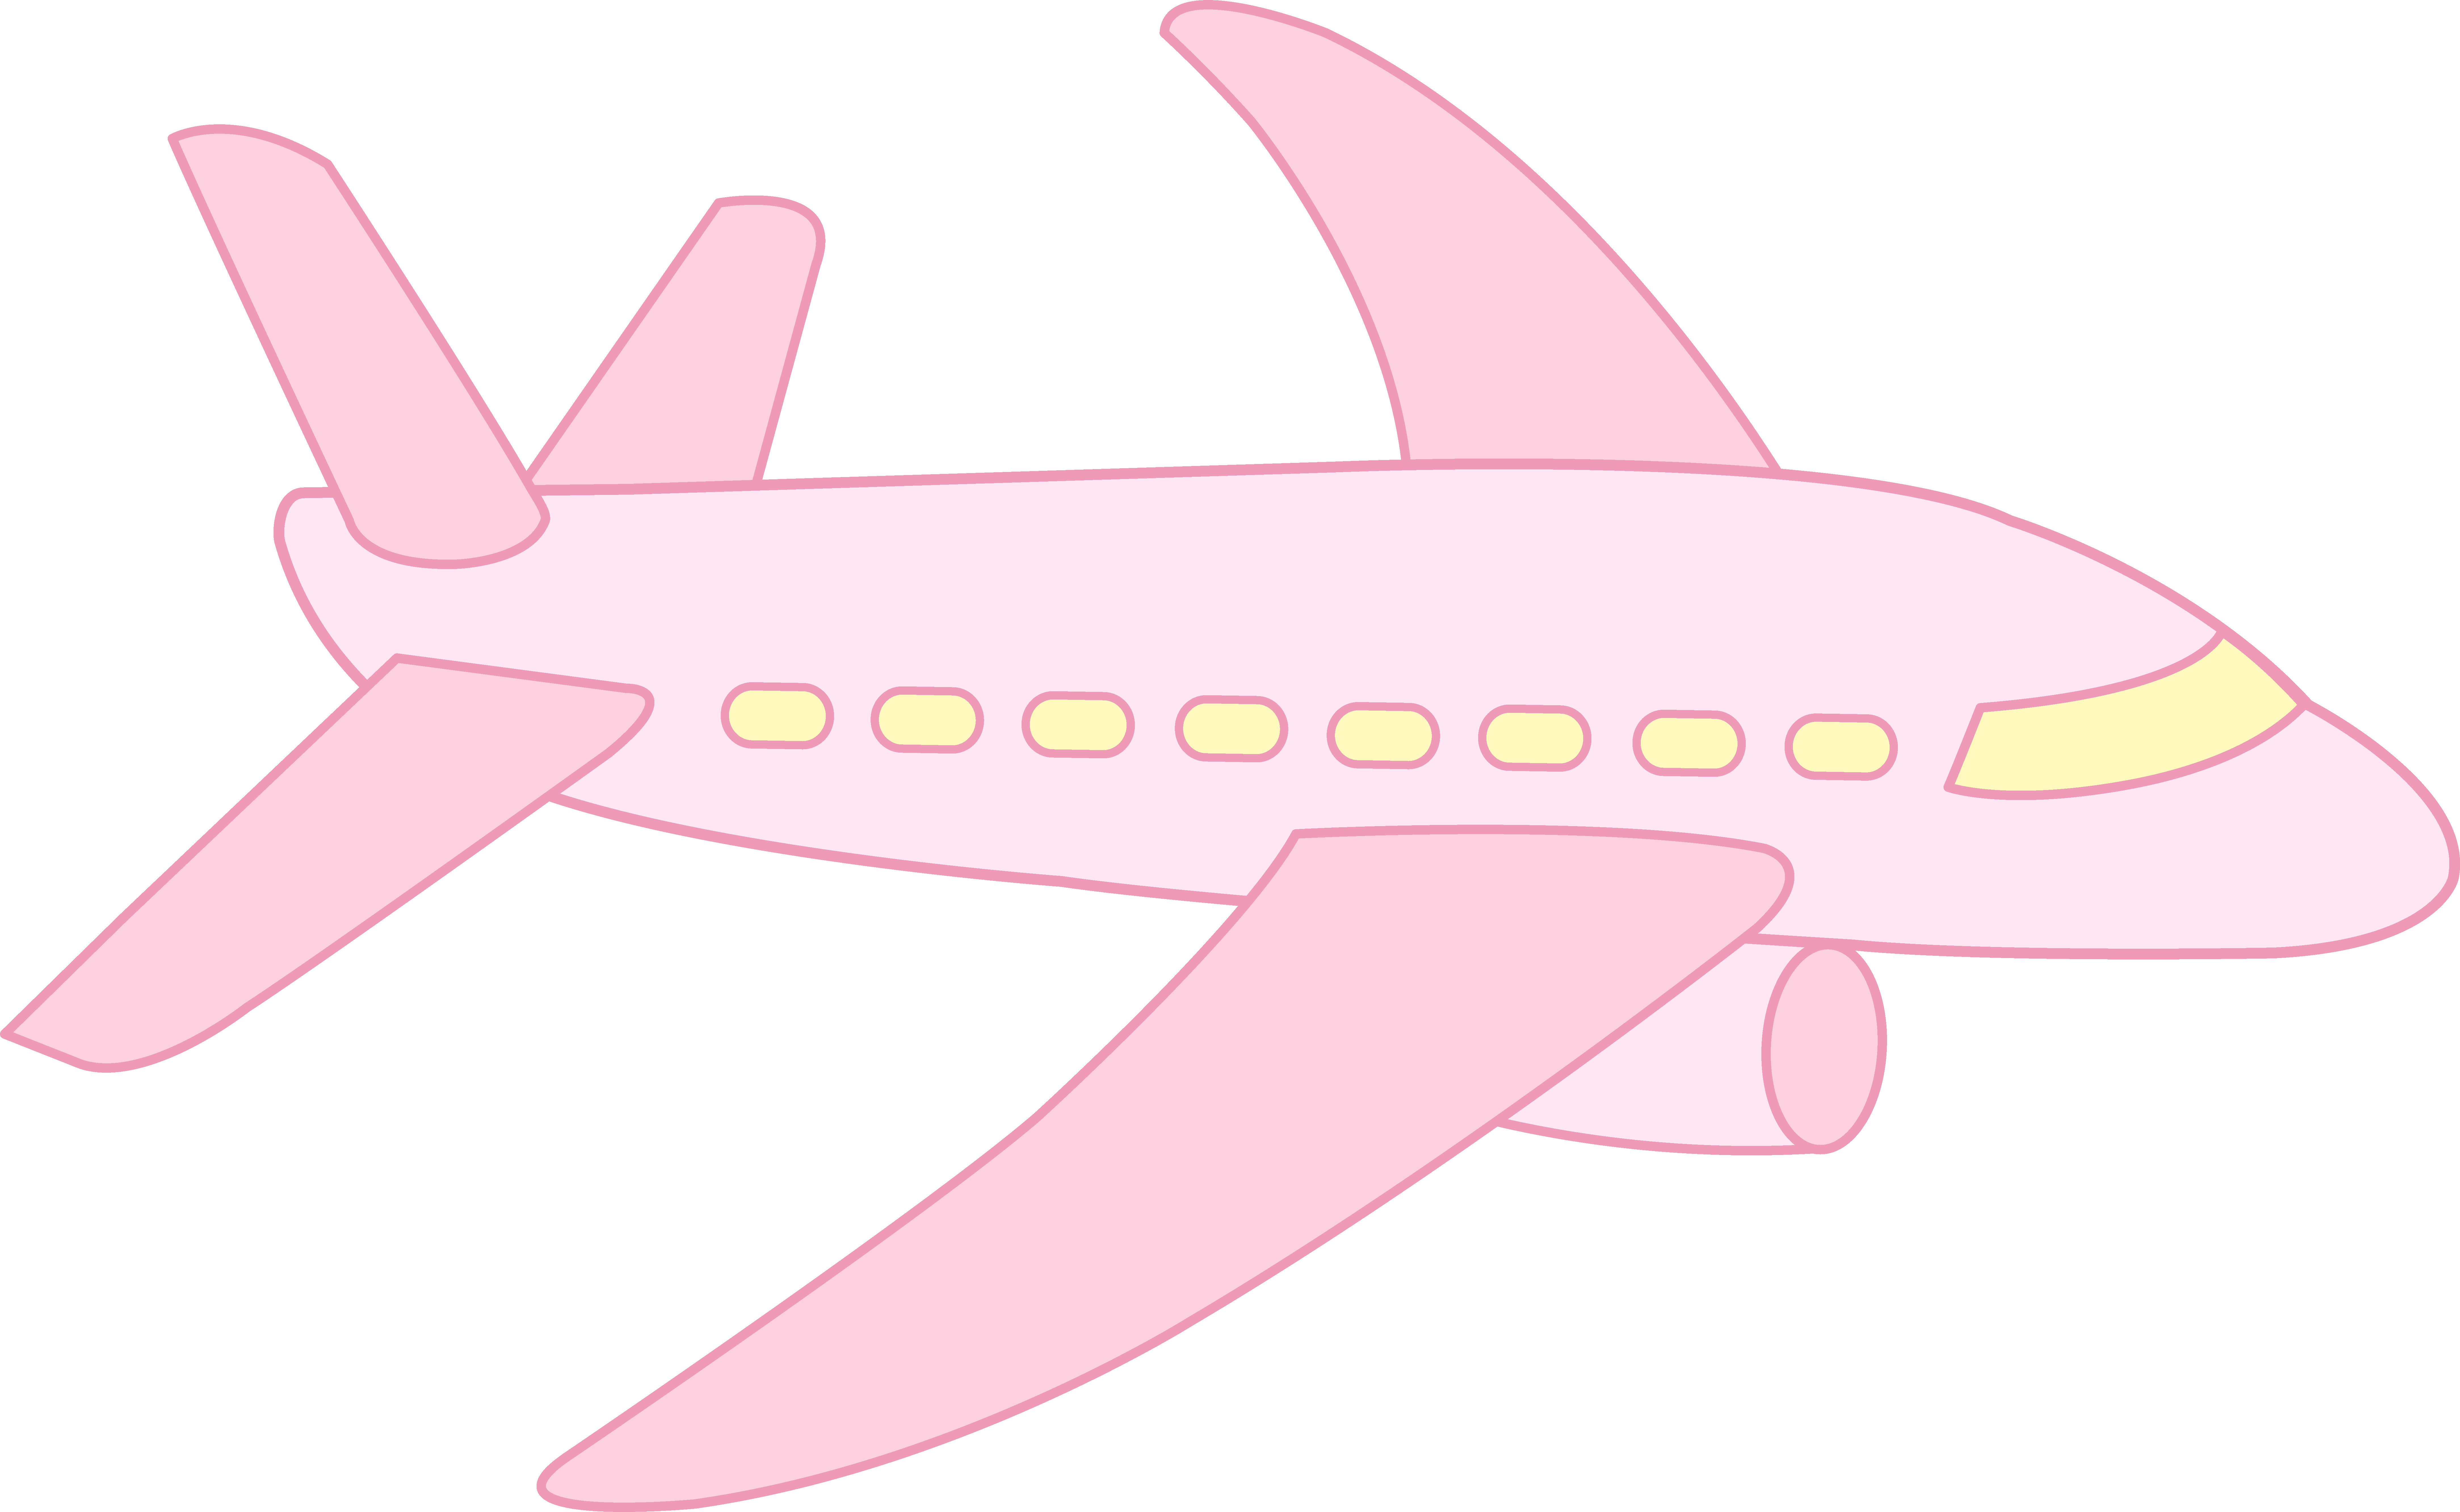 medium resolution of cute airplane cute pink airplane free clip art